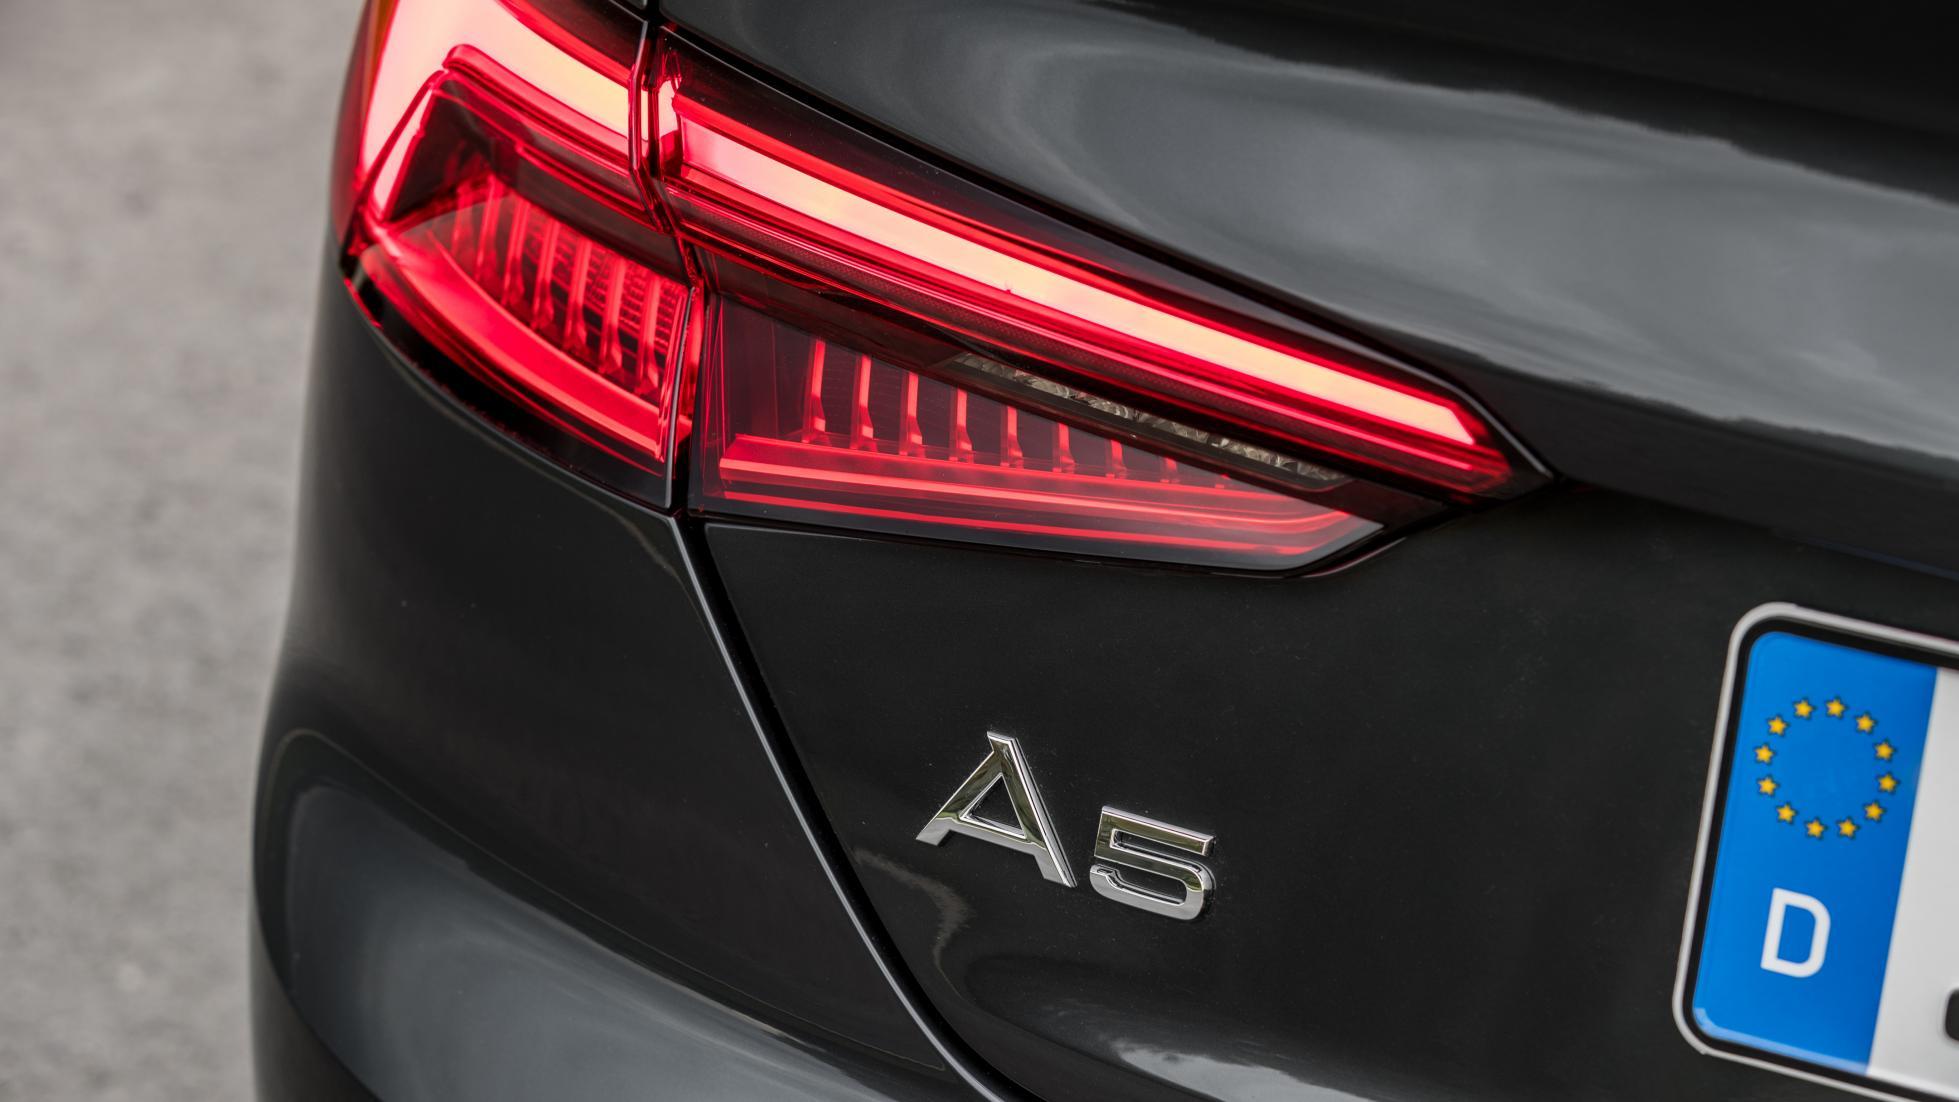 Audi A5 Sportback rear led lights